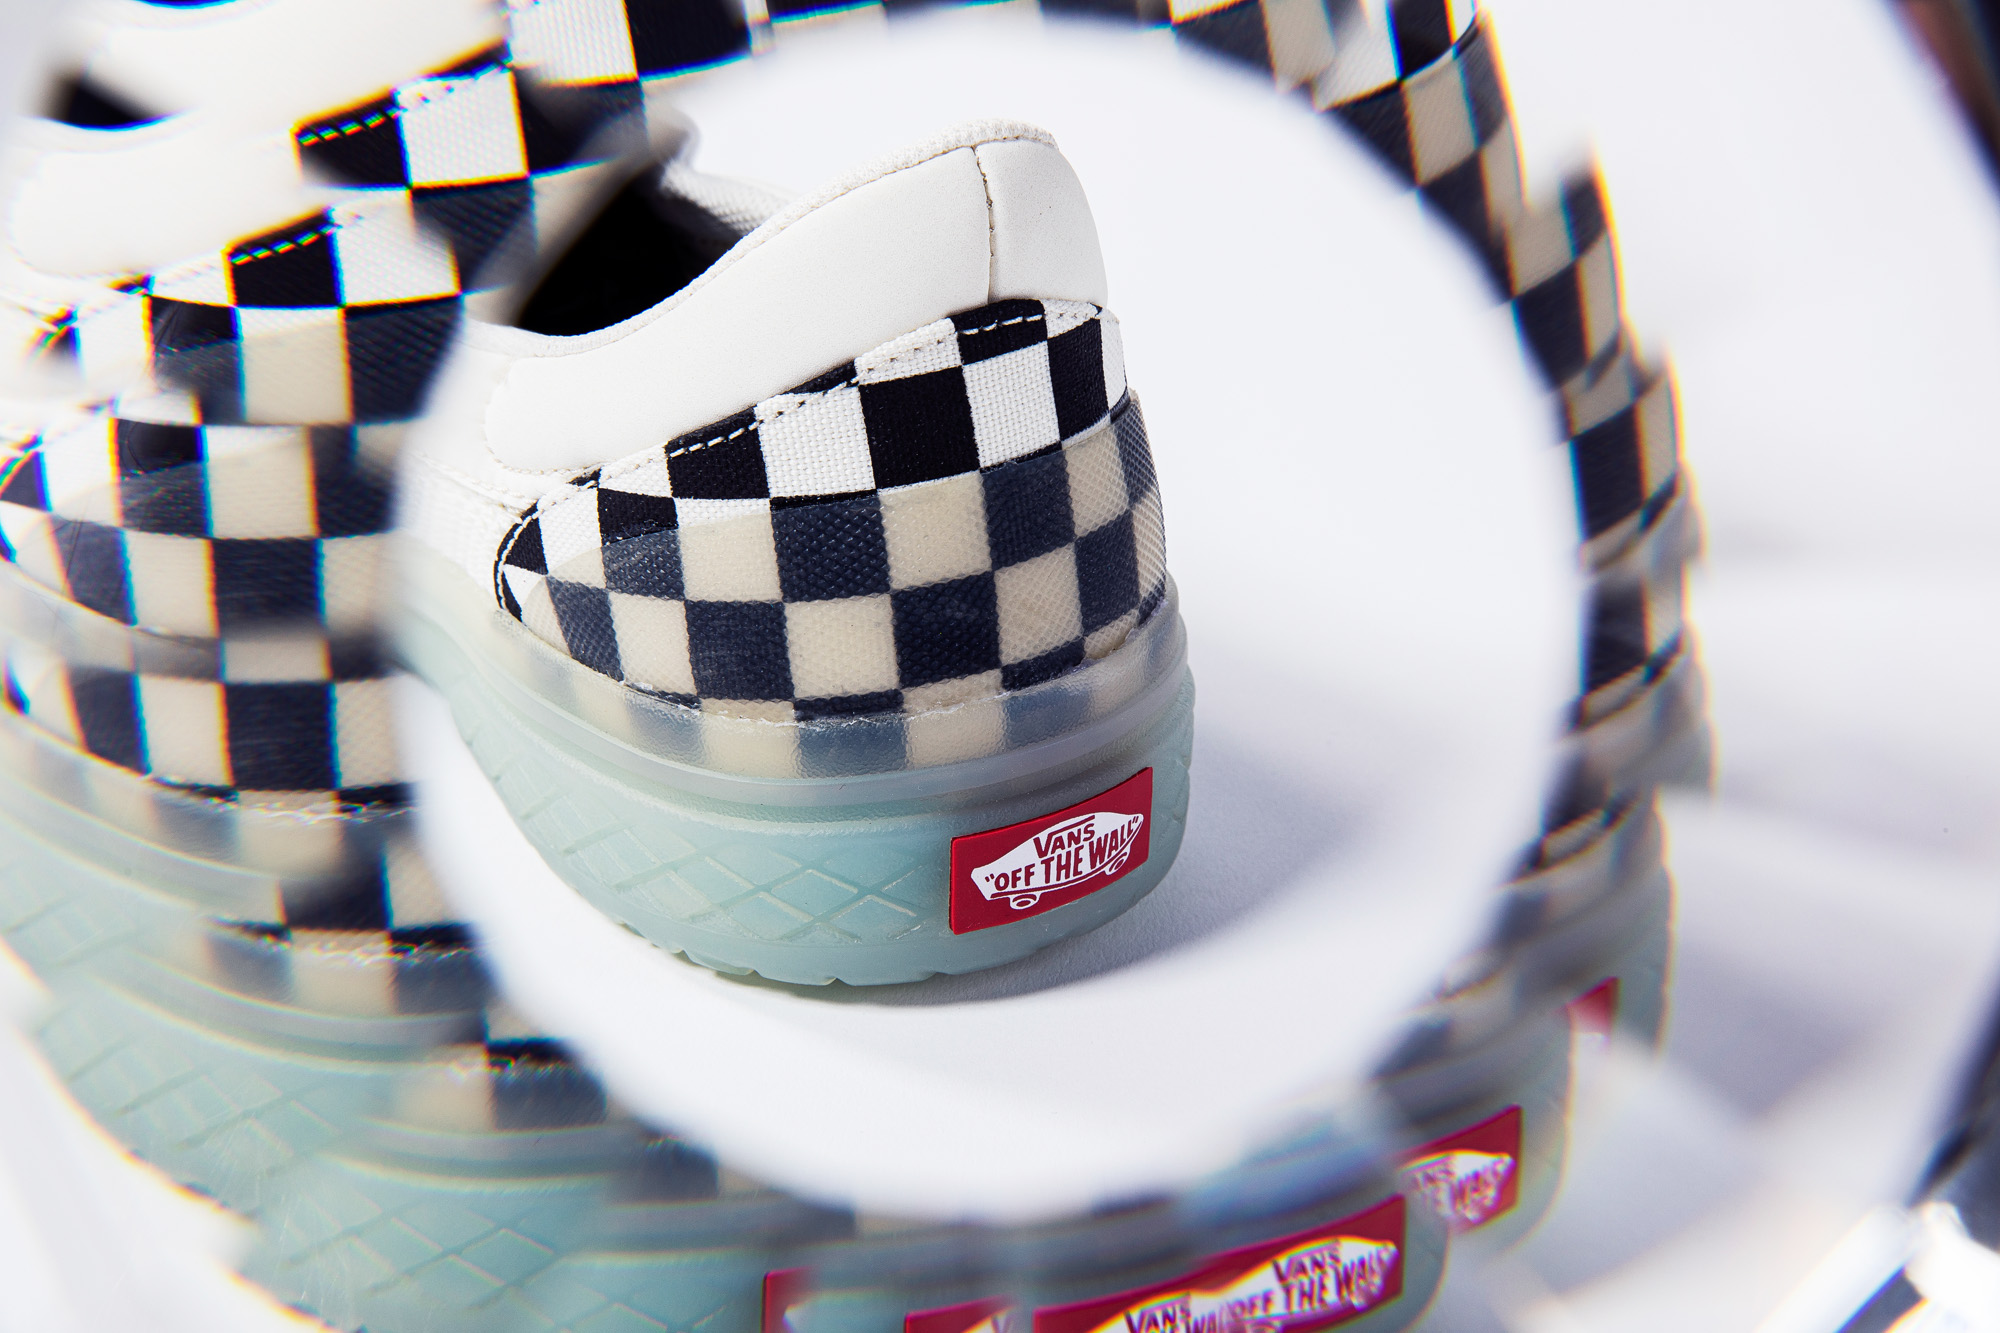 Vans prezentuje nowy ultralekki model butów slip on – Mod